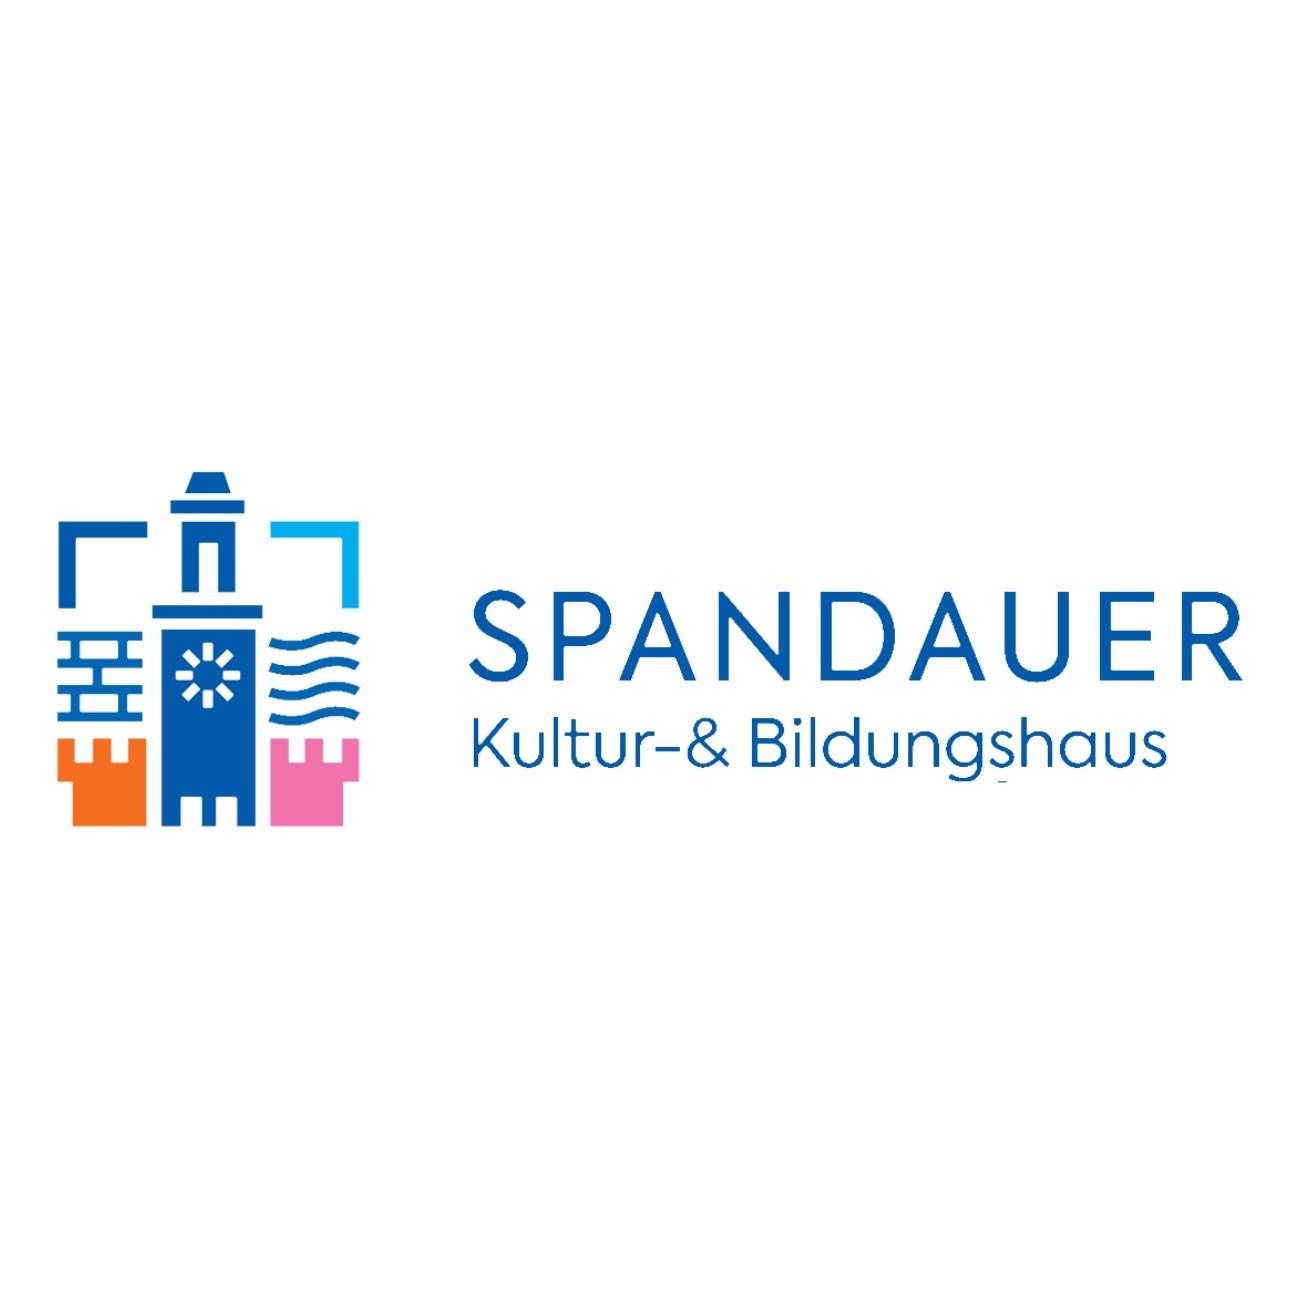 Spandauer Kultur & Bildungshaus